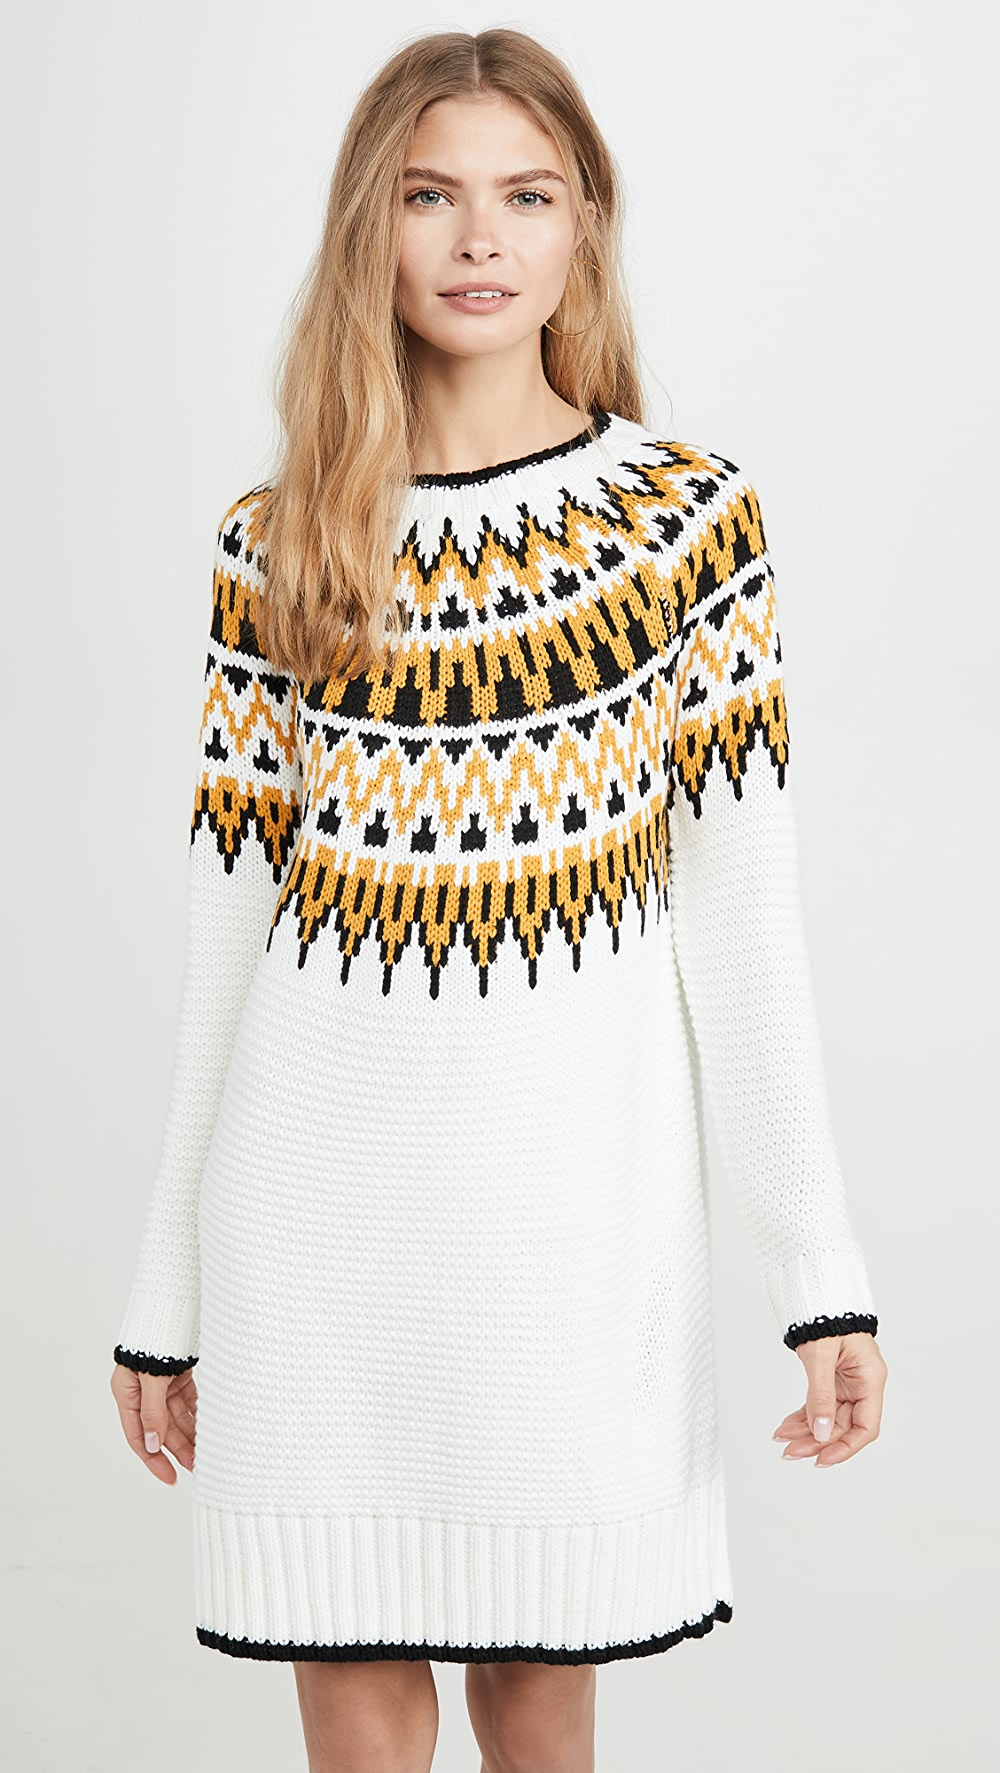 100% Quality Minkpink - Imogen Fairsile Sweater Dress Rapid Heat Dissipation